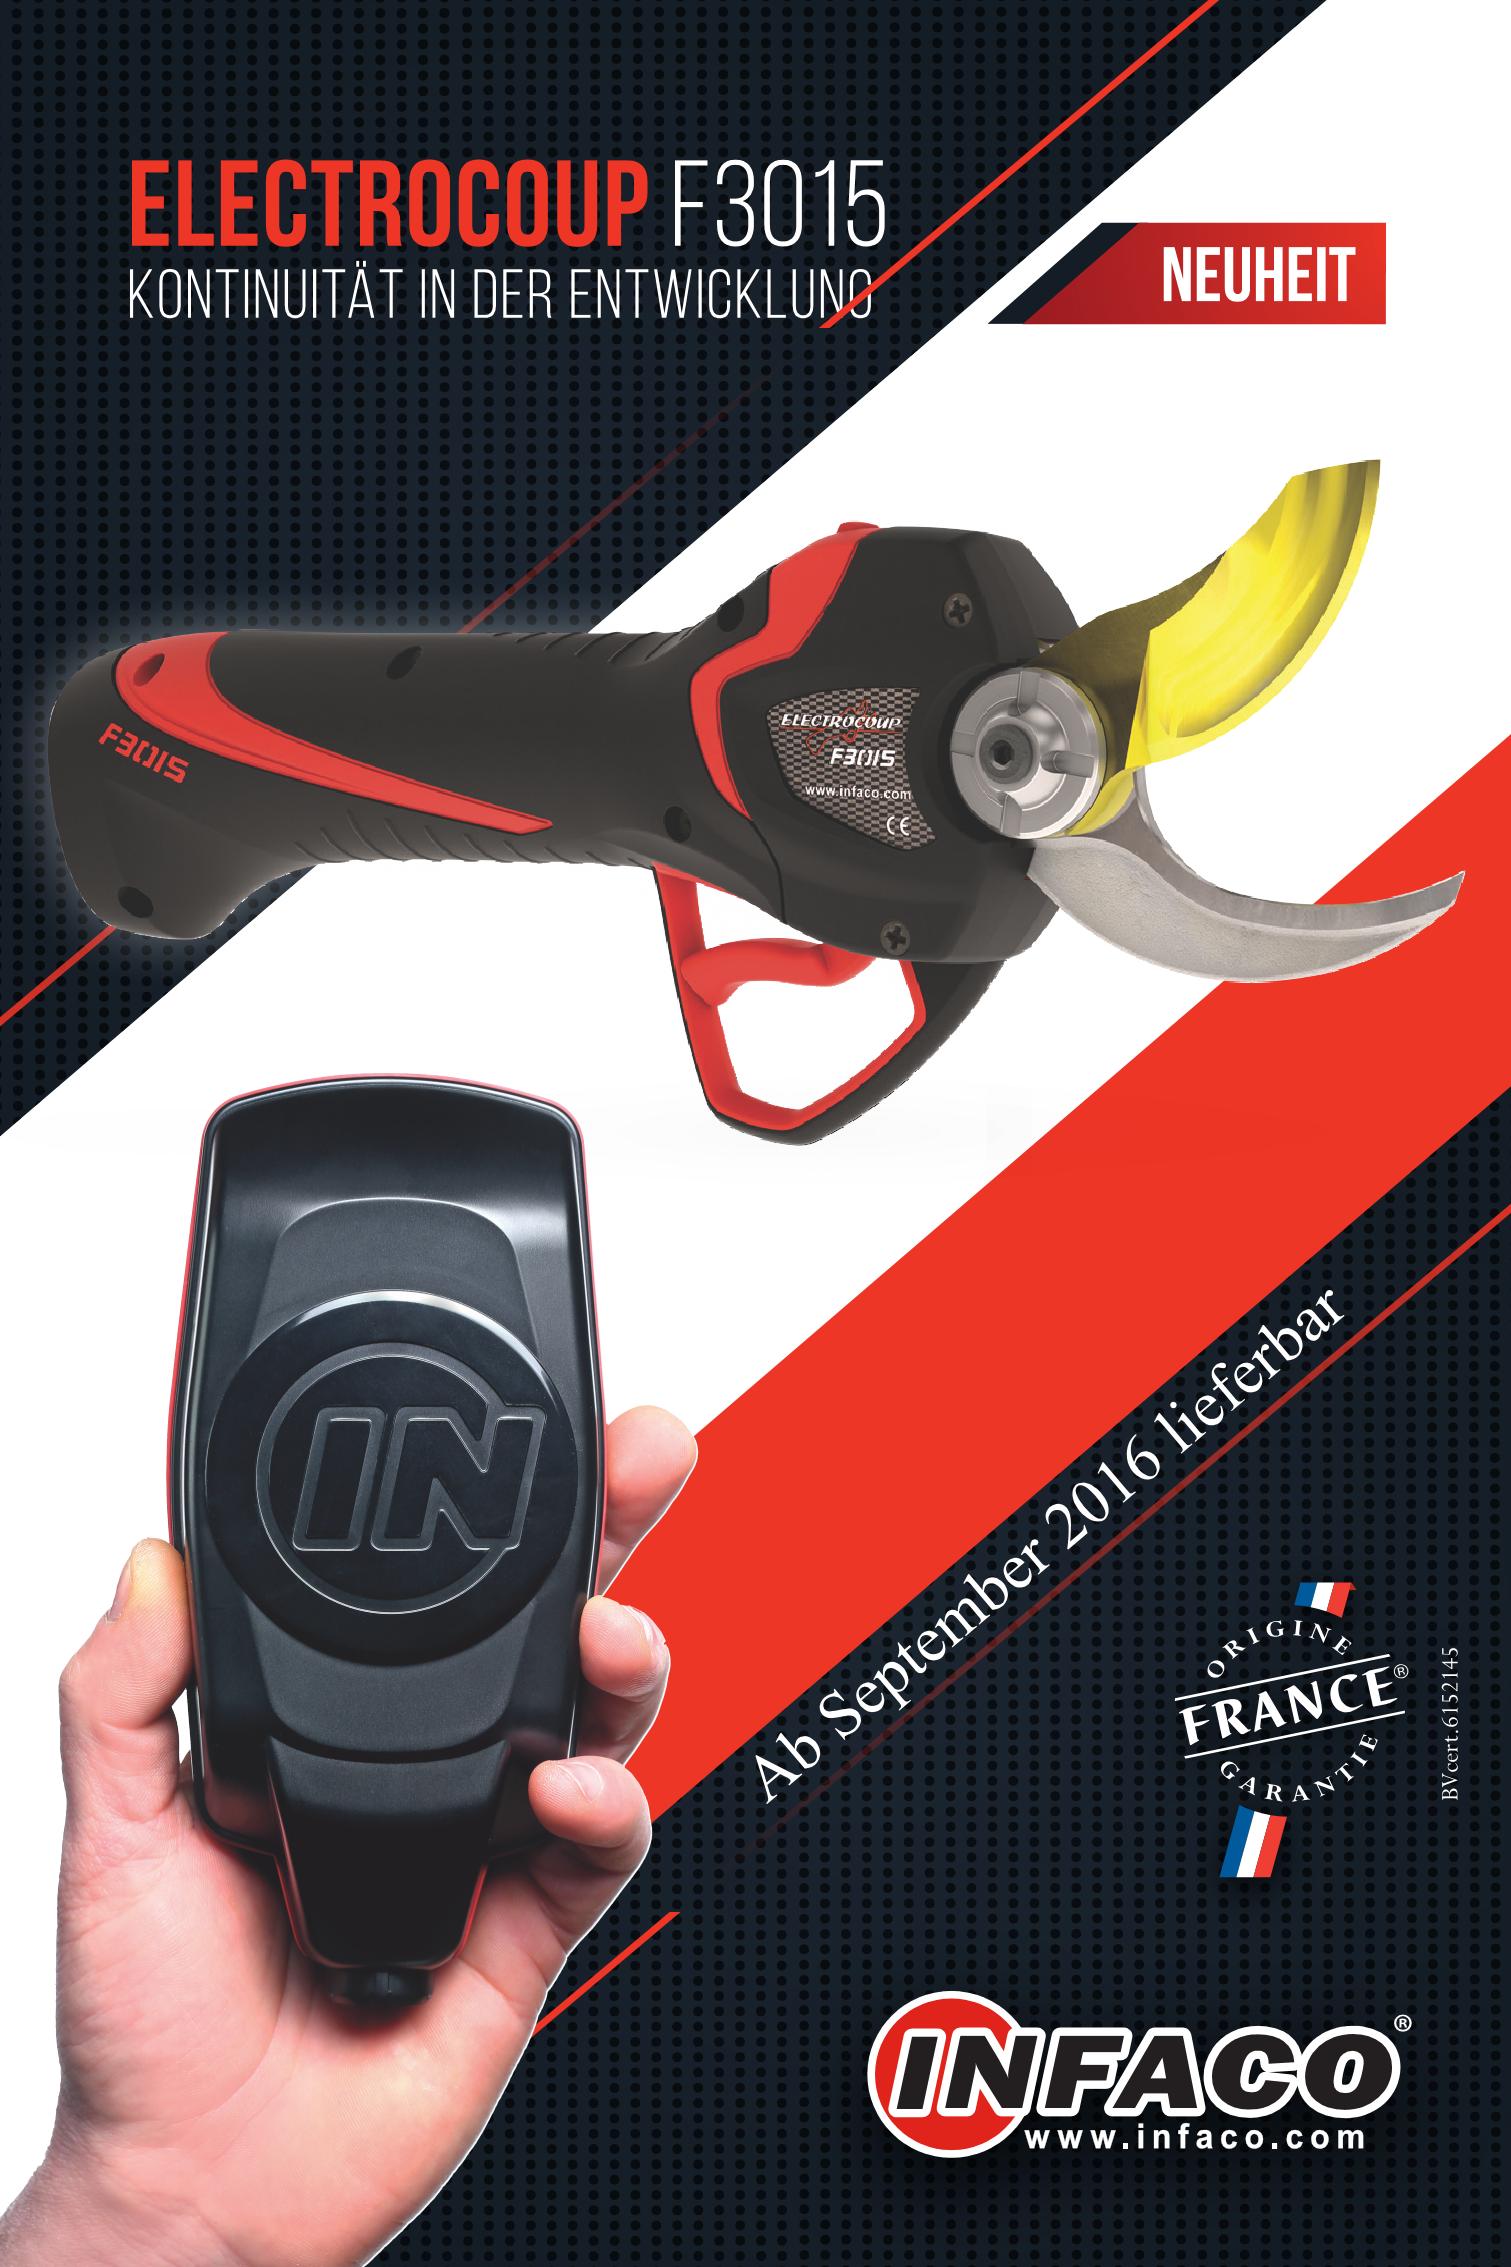 Neuheit electrocoup F3015